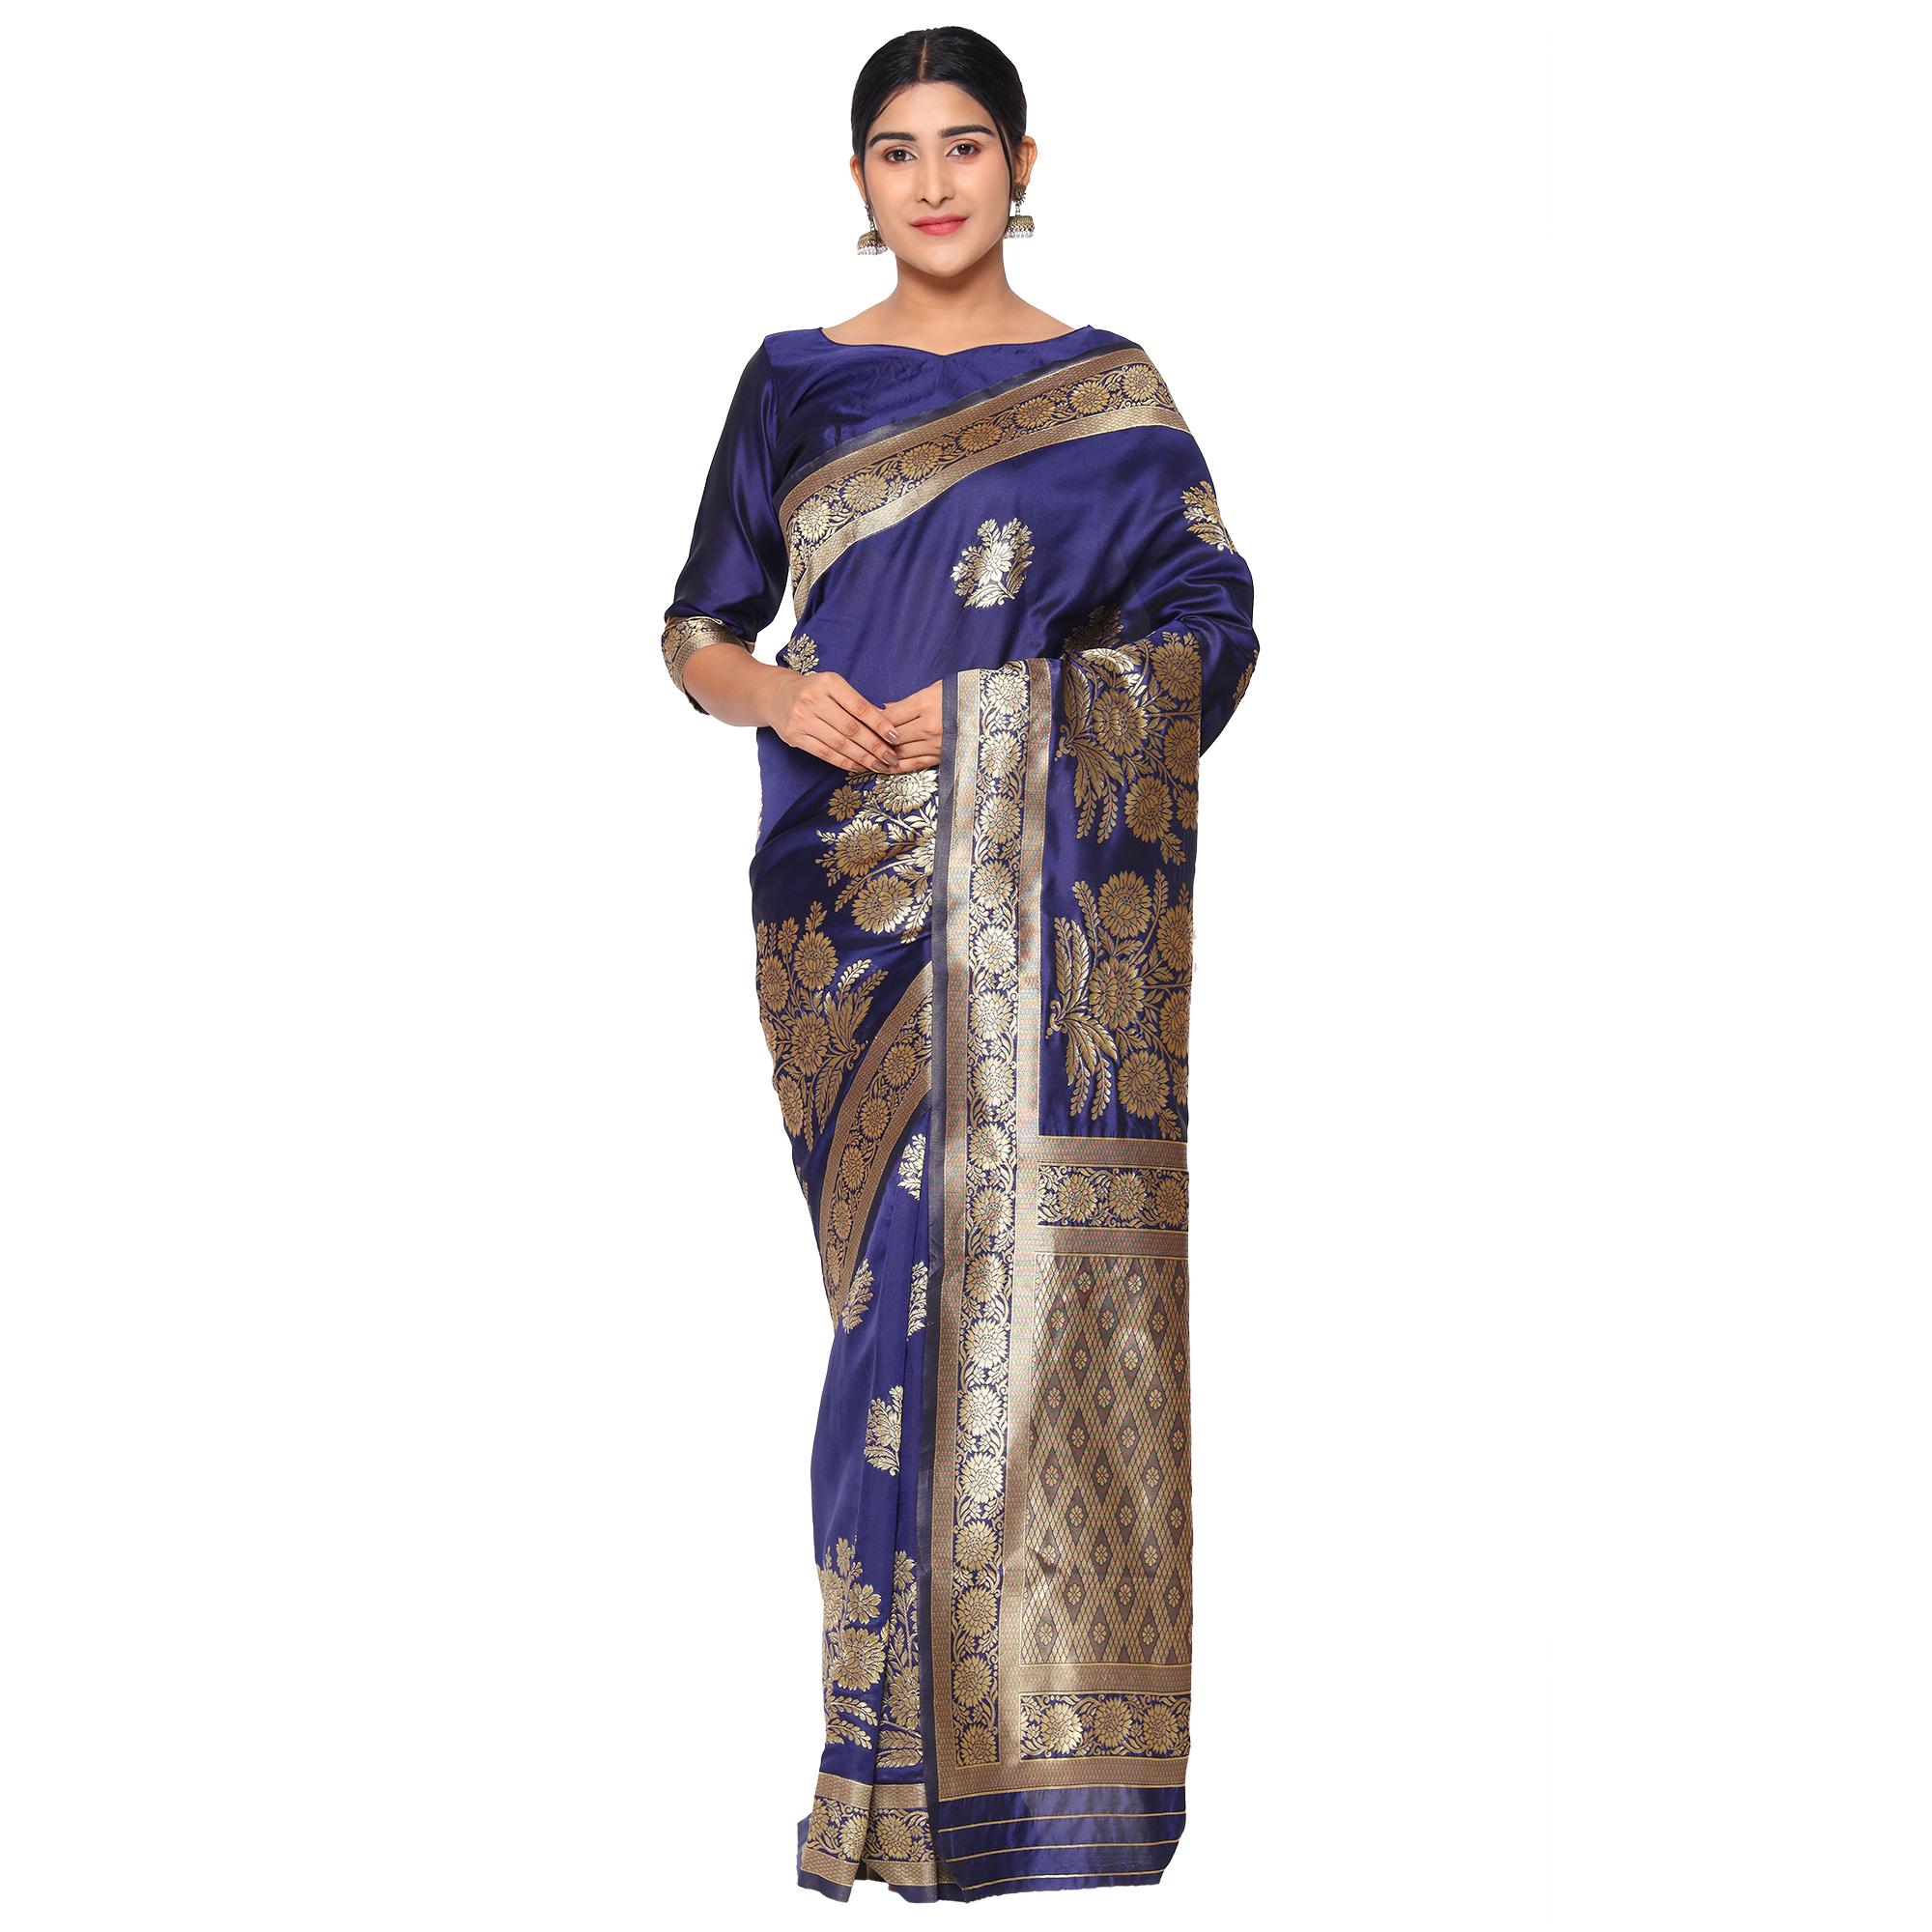 Glemora | Glemora Nevy Blue Designer Ethnic Wear Silk Blend Banarasi Traditional Saree